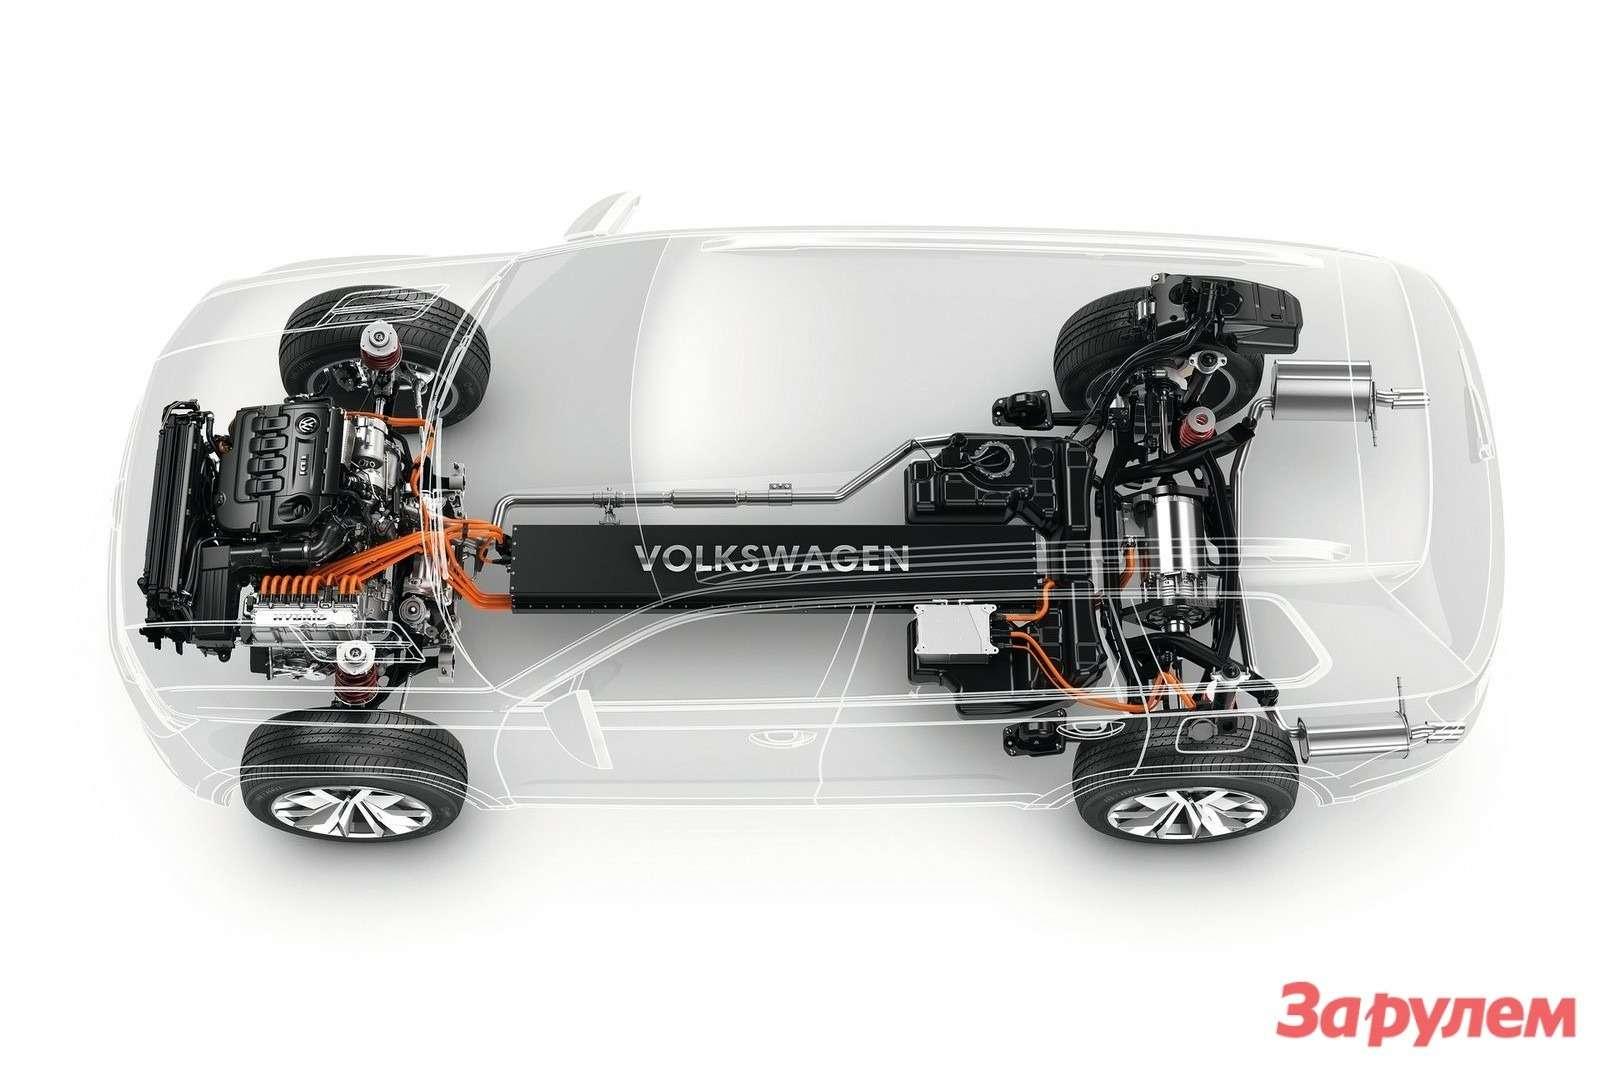 Volkswagen CrossBlue Concept technical image 1